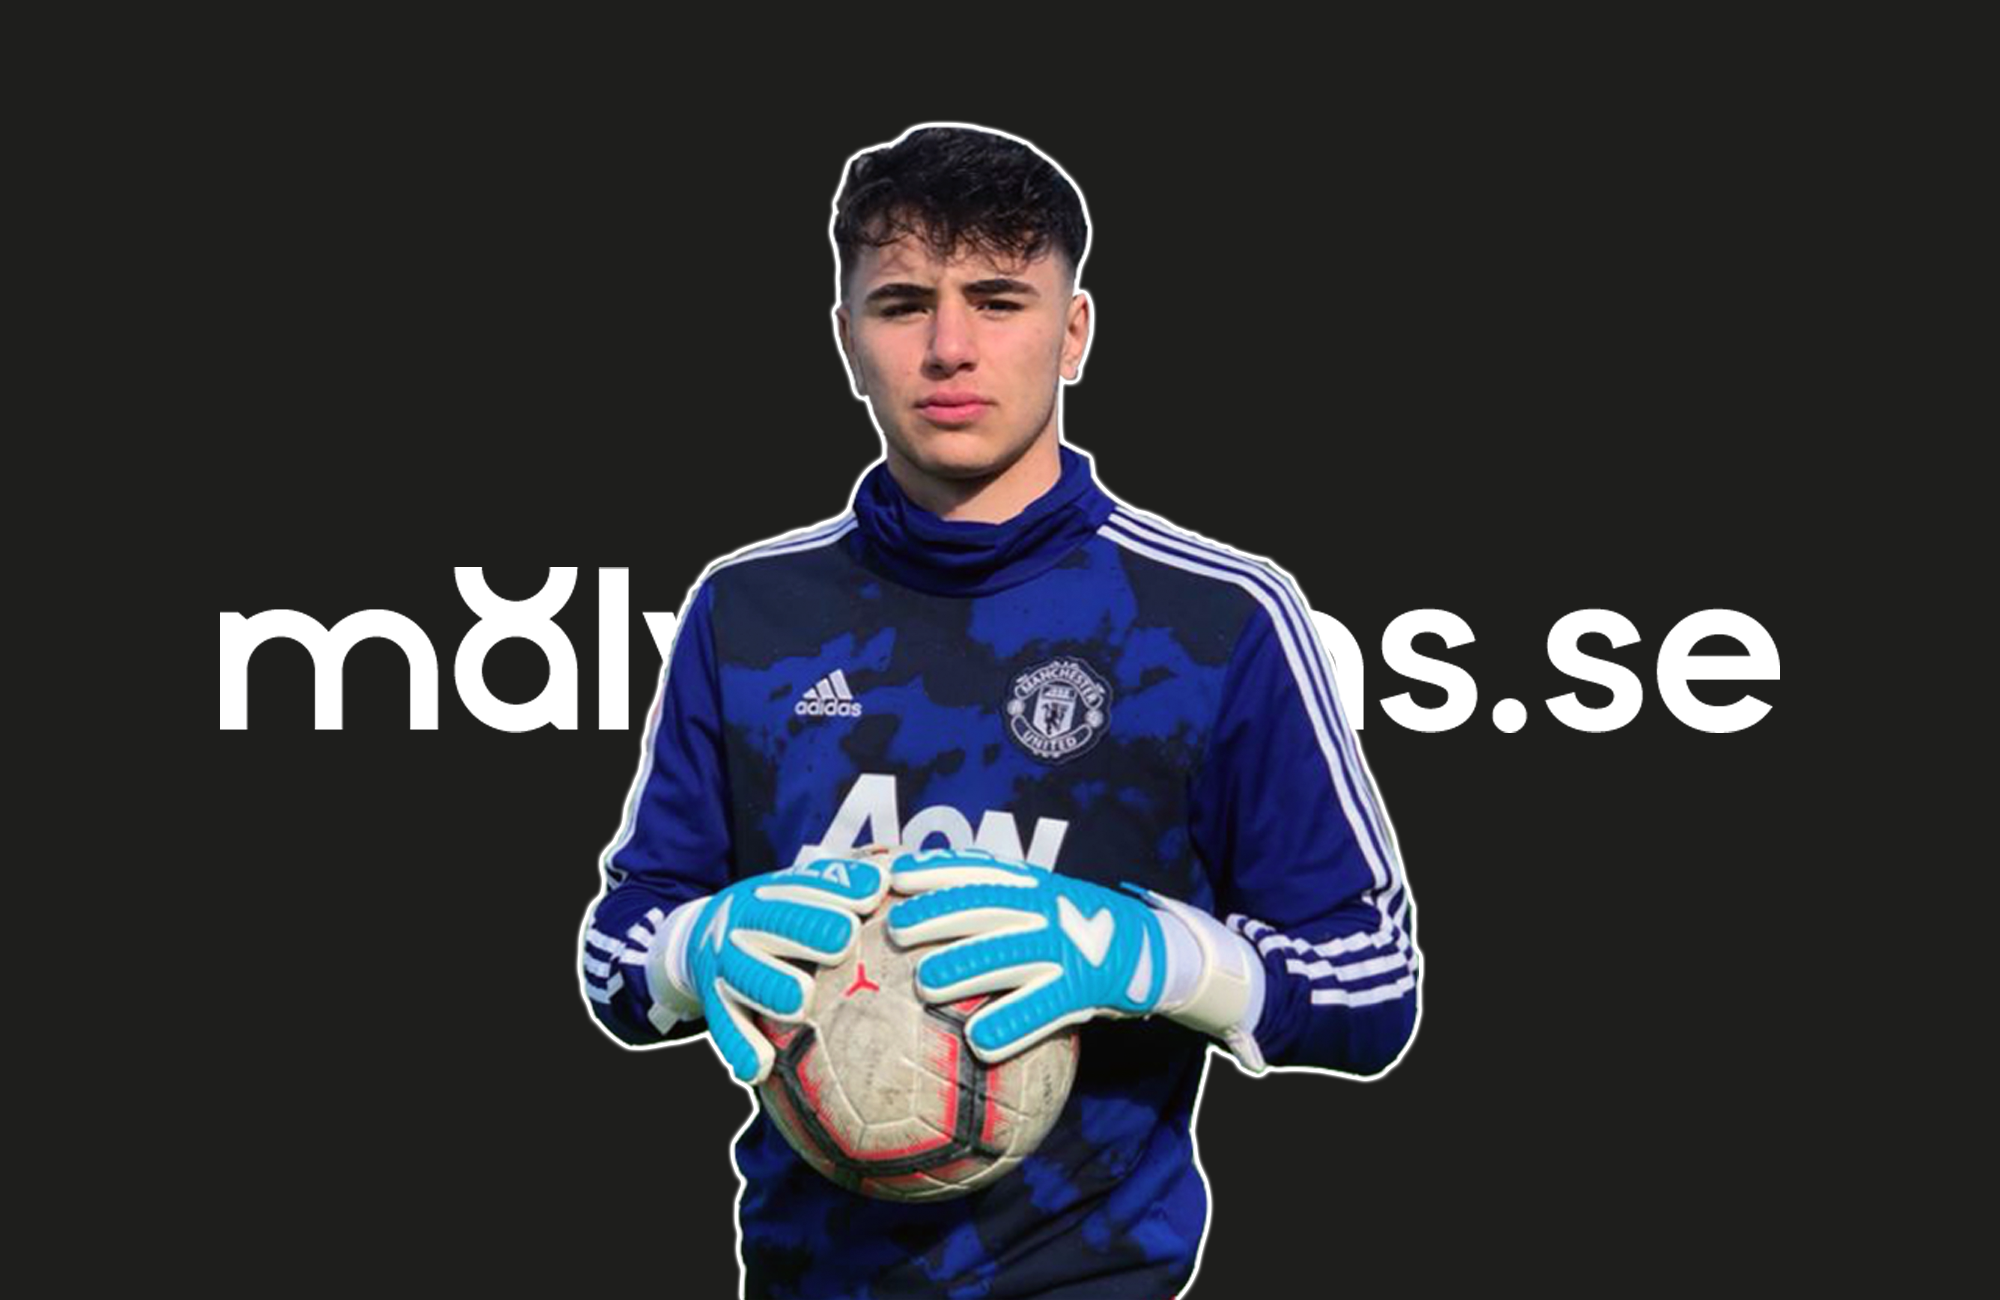 Johan Guadagno, målvakt i Manchester United